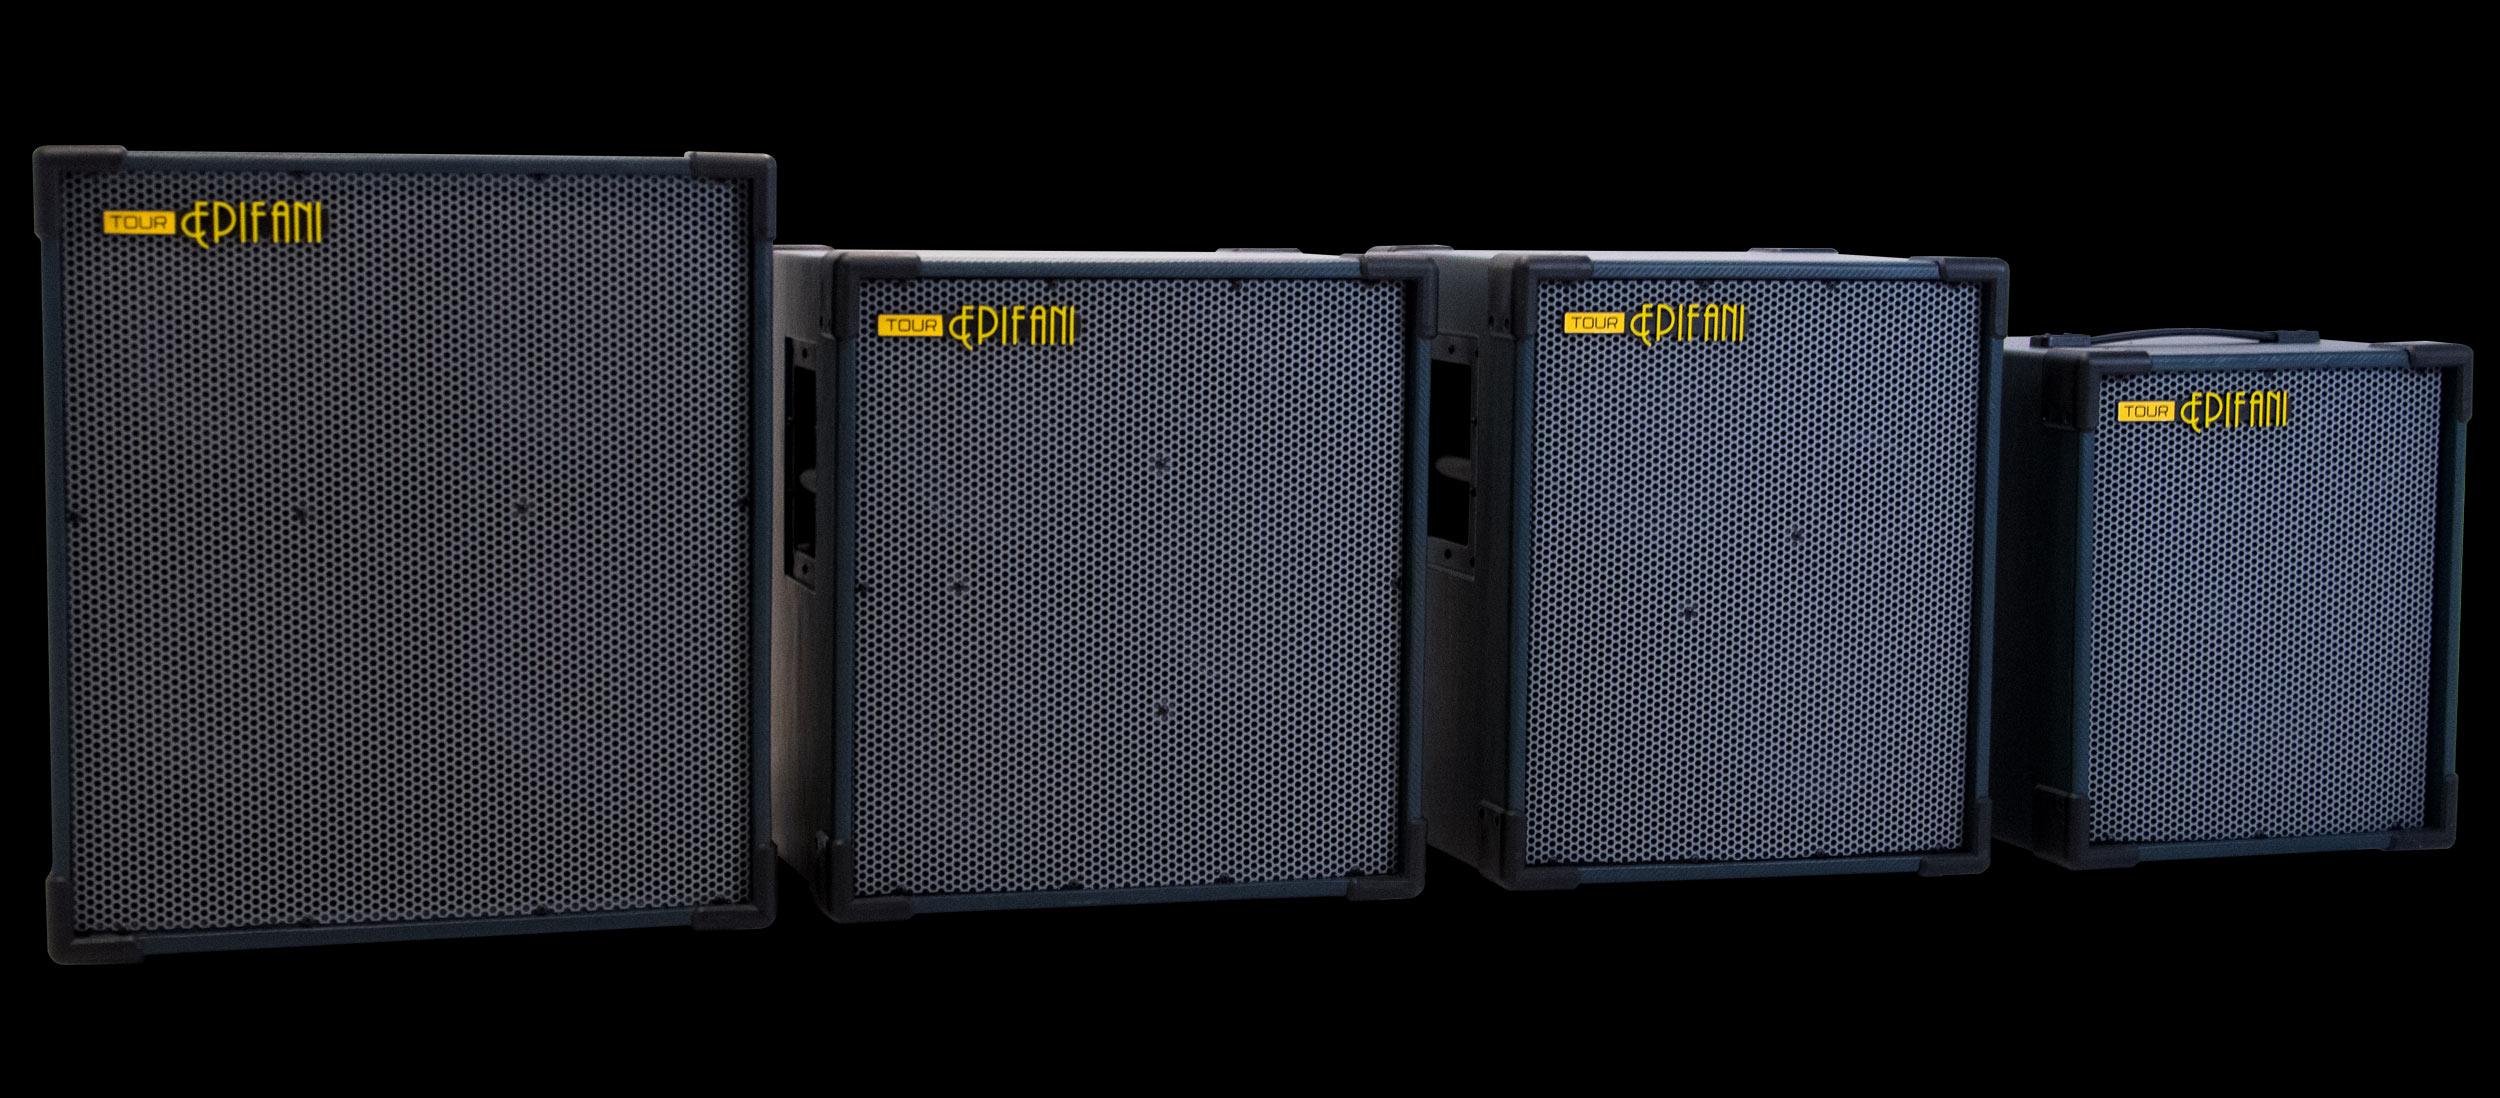 epifani-tour-bass-speaker-cabinet-series.jpg